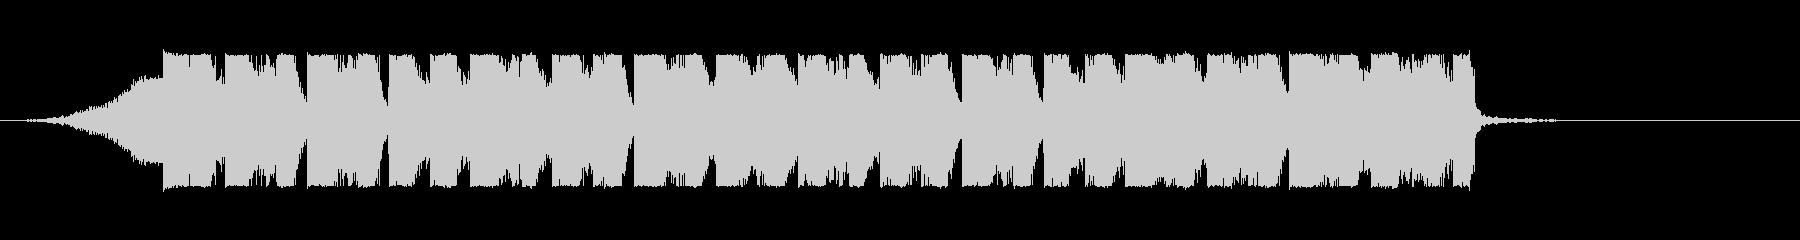 EDM パリピなイメージのジングルの未再生の波形